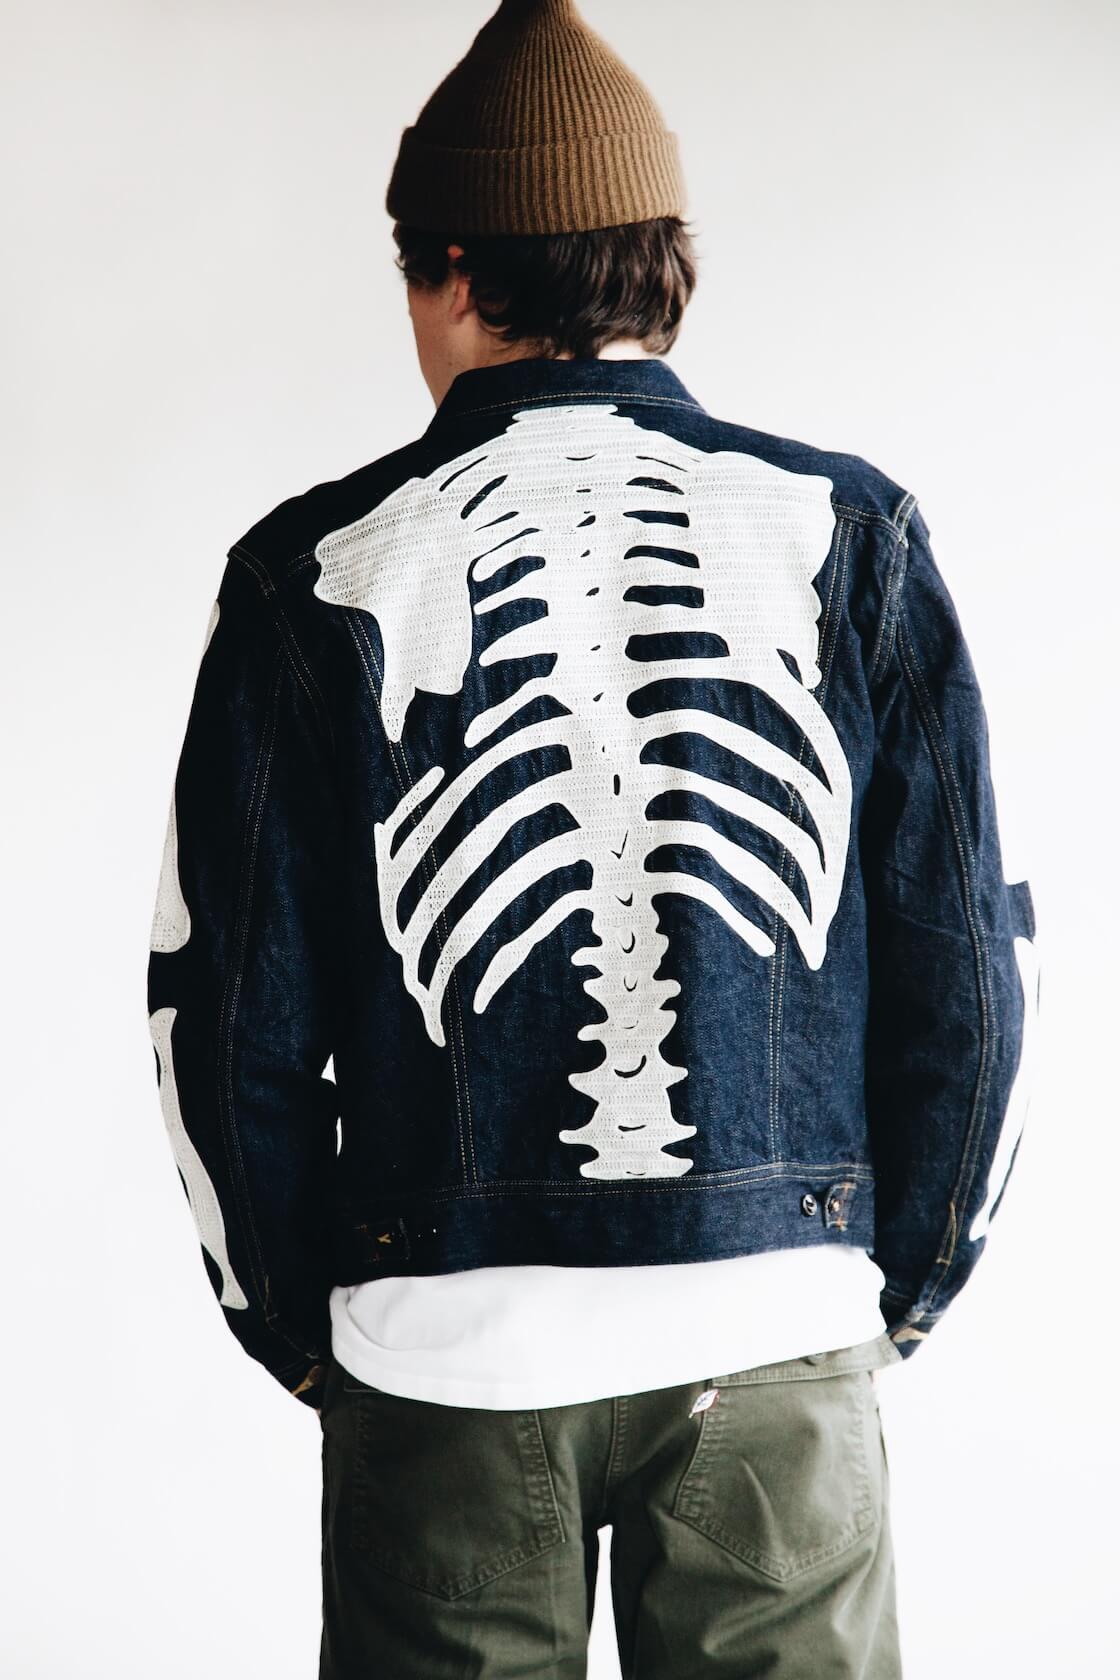 kapital kountry 11.5oz denim westerner (bone) and pure blue japan military pants on body